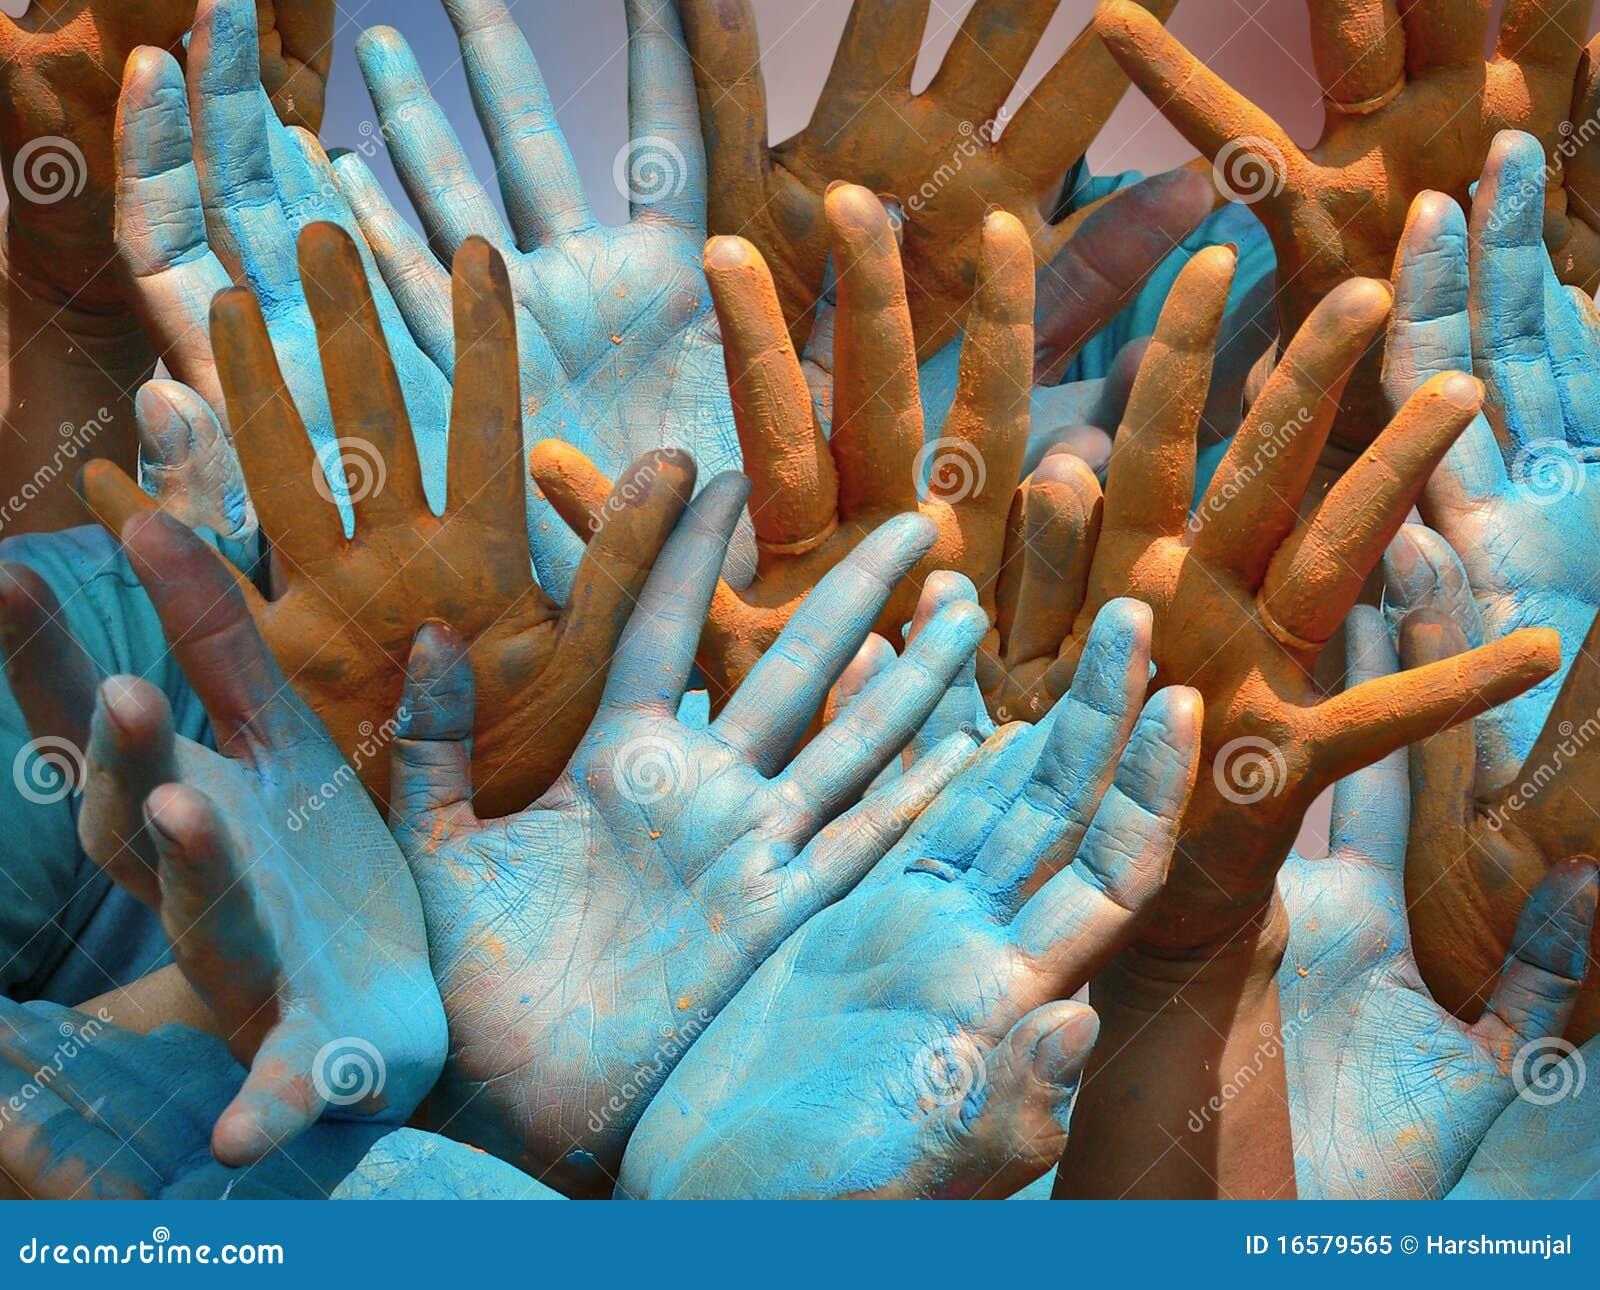 Holi - mains humaines colorées